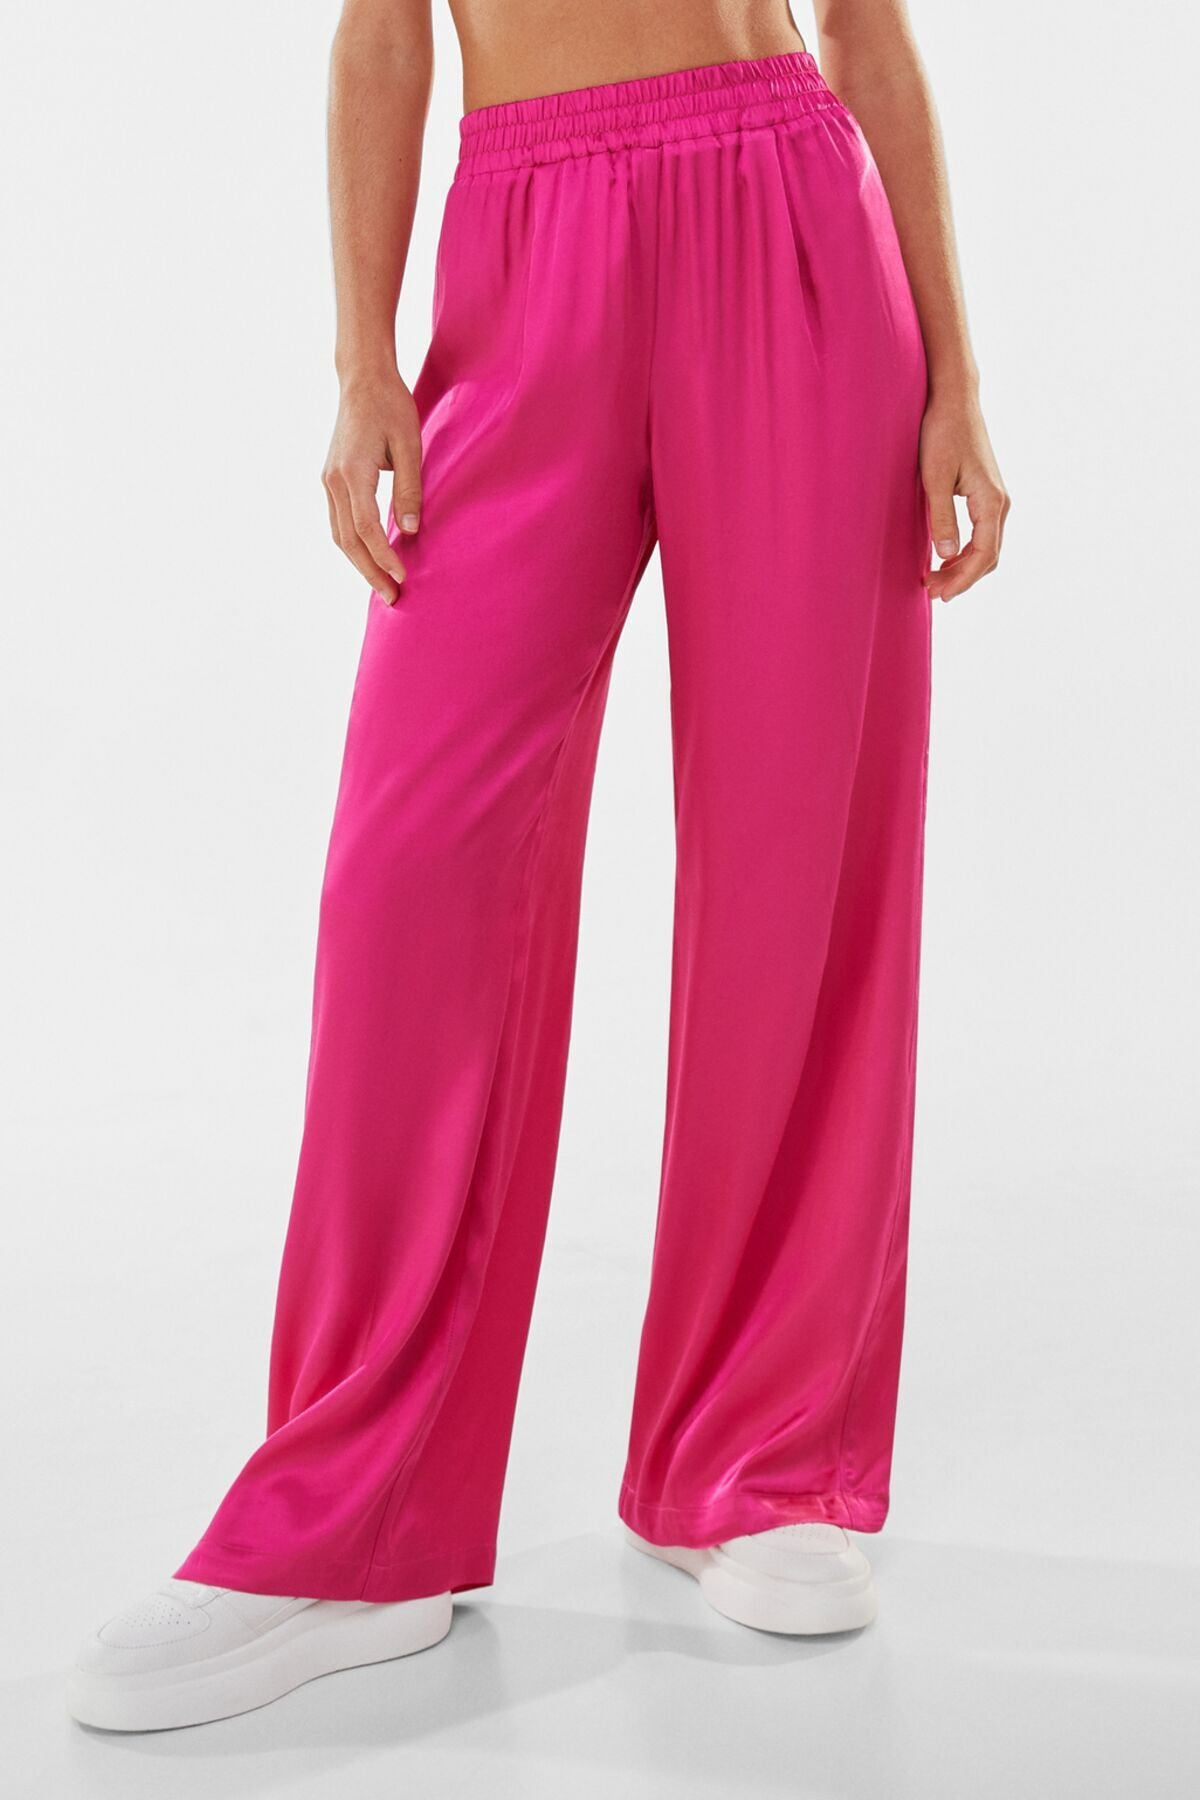 Bershka Kadın Pembe Wide Leg Saten Pantolon 00122200